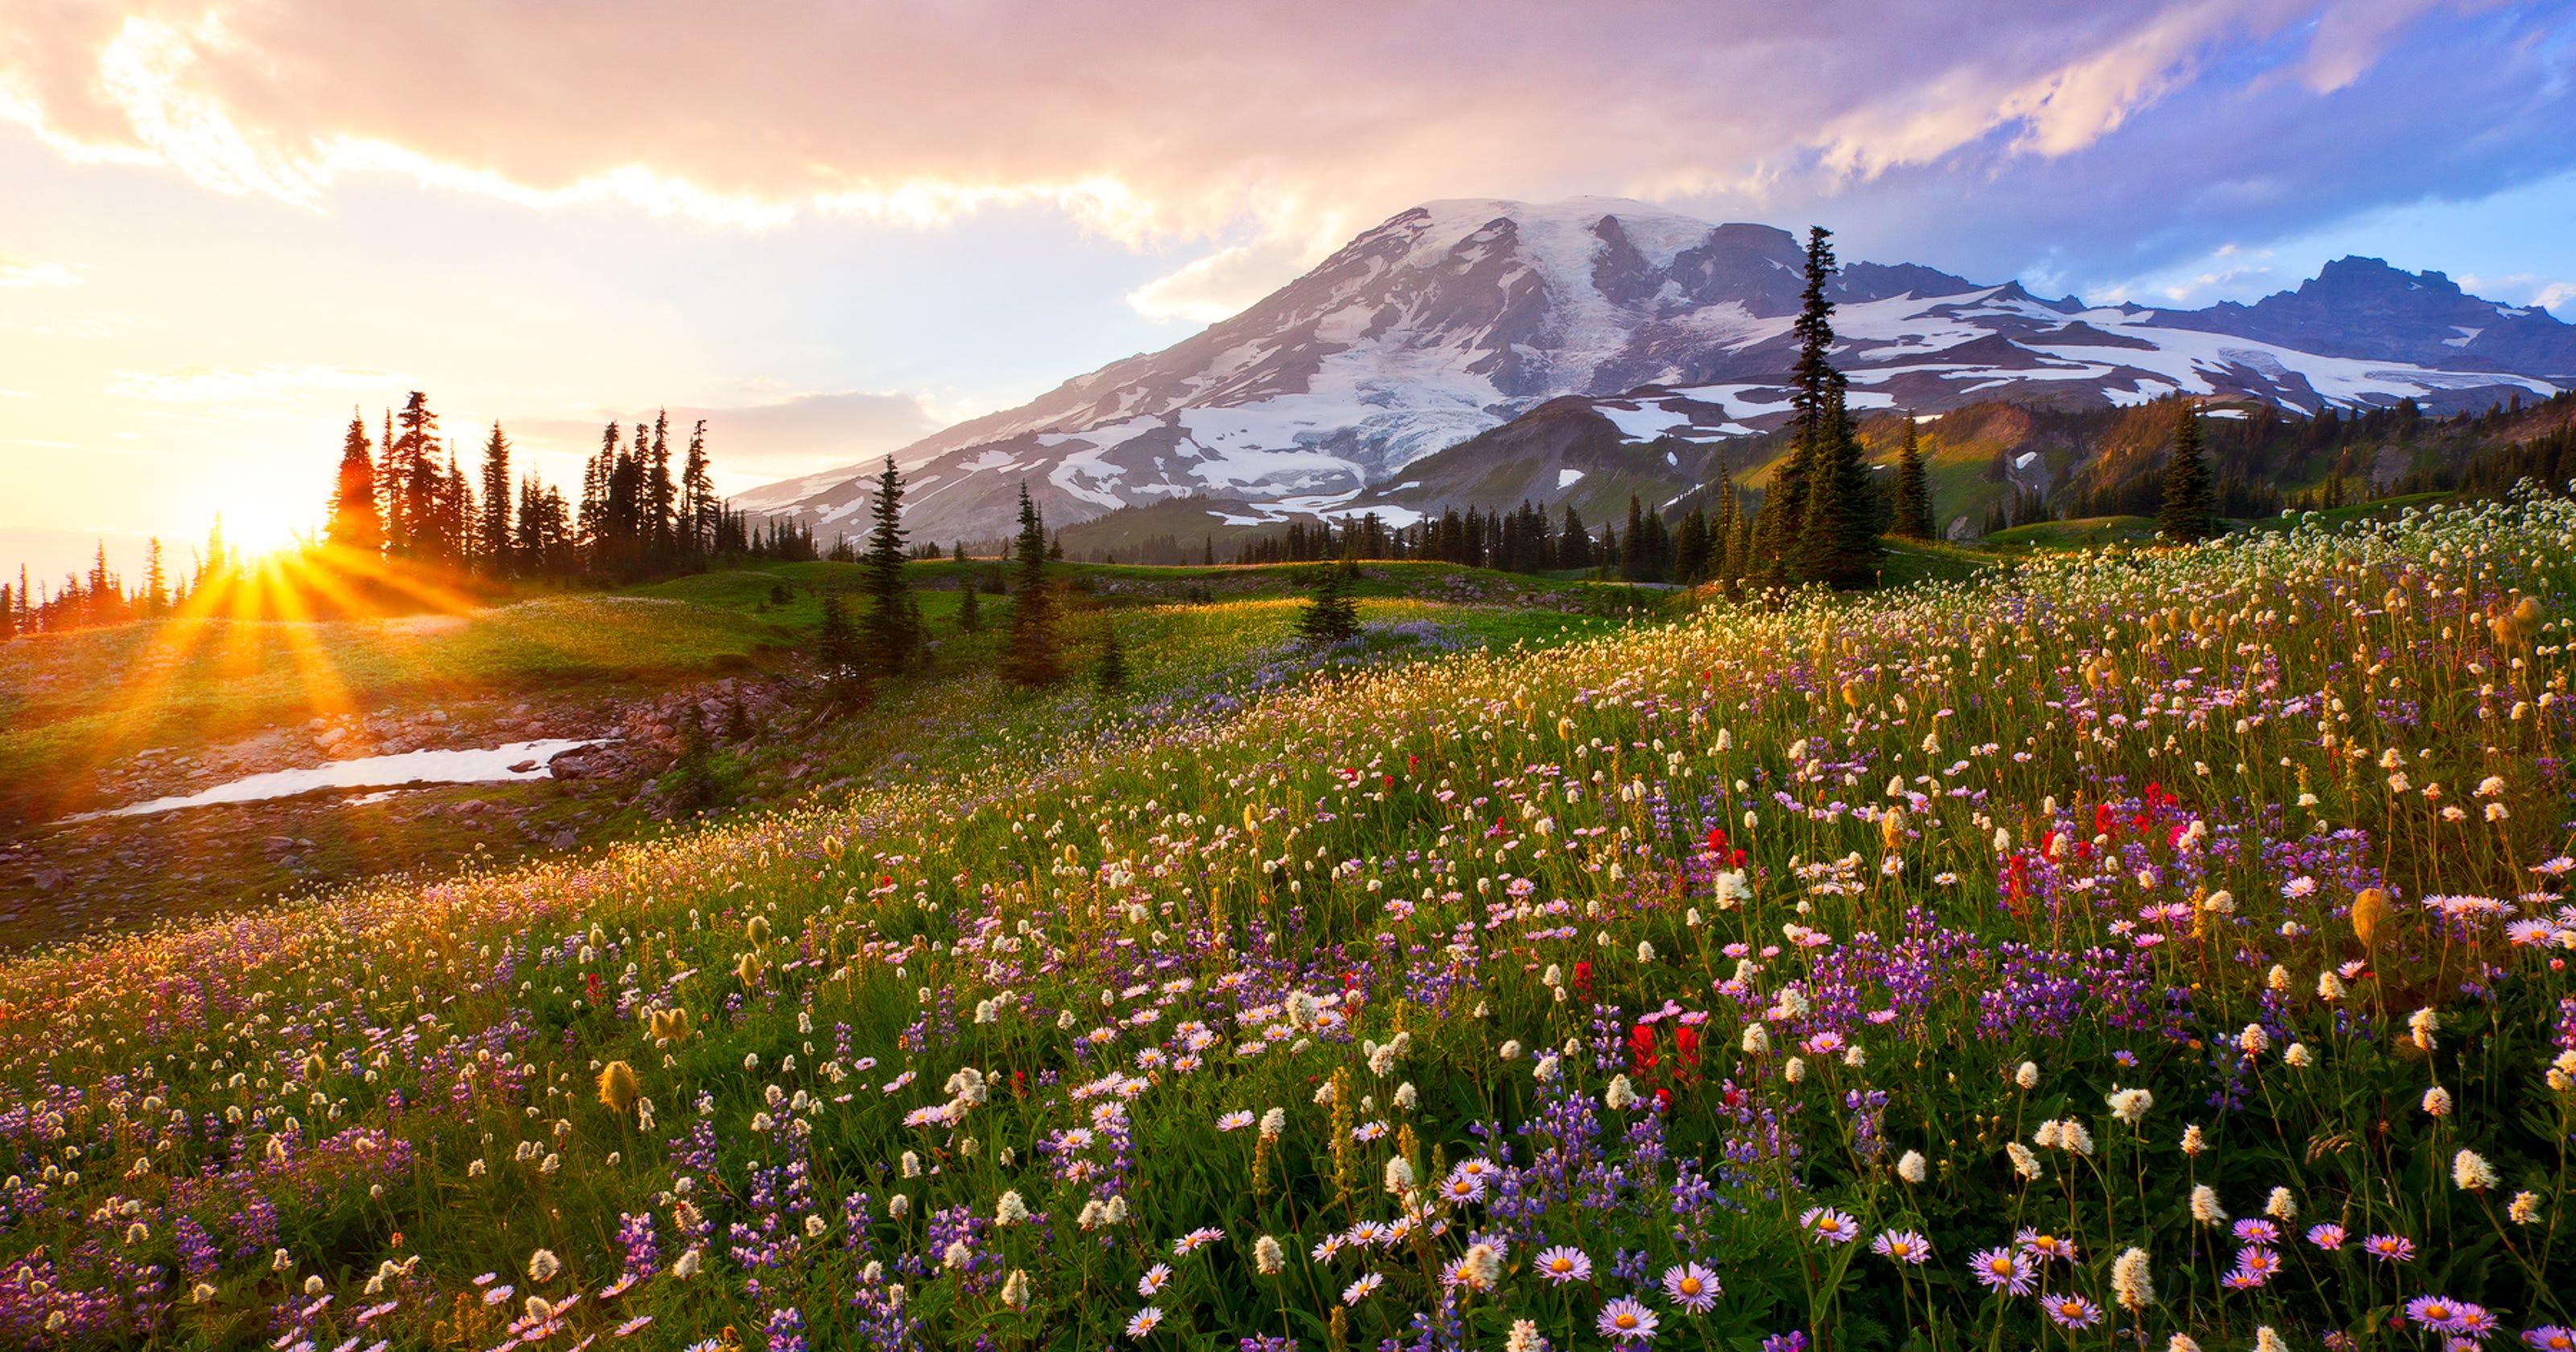 Mount Rainier National Park: Over 230,000 acres of natural beauty